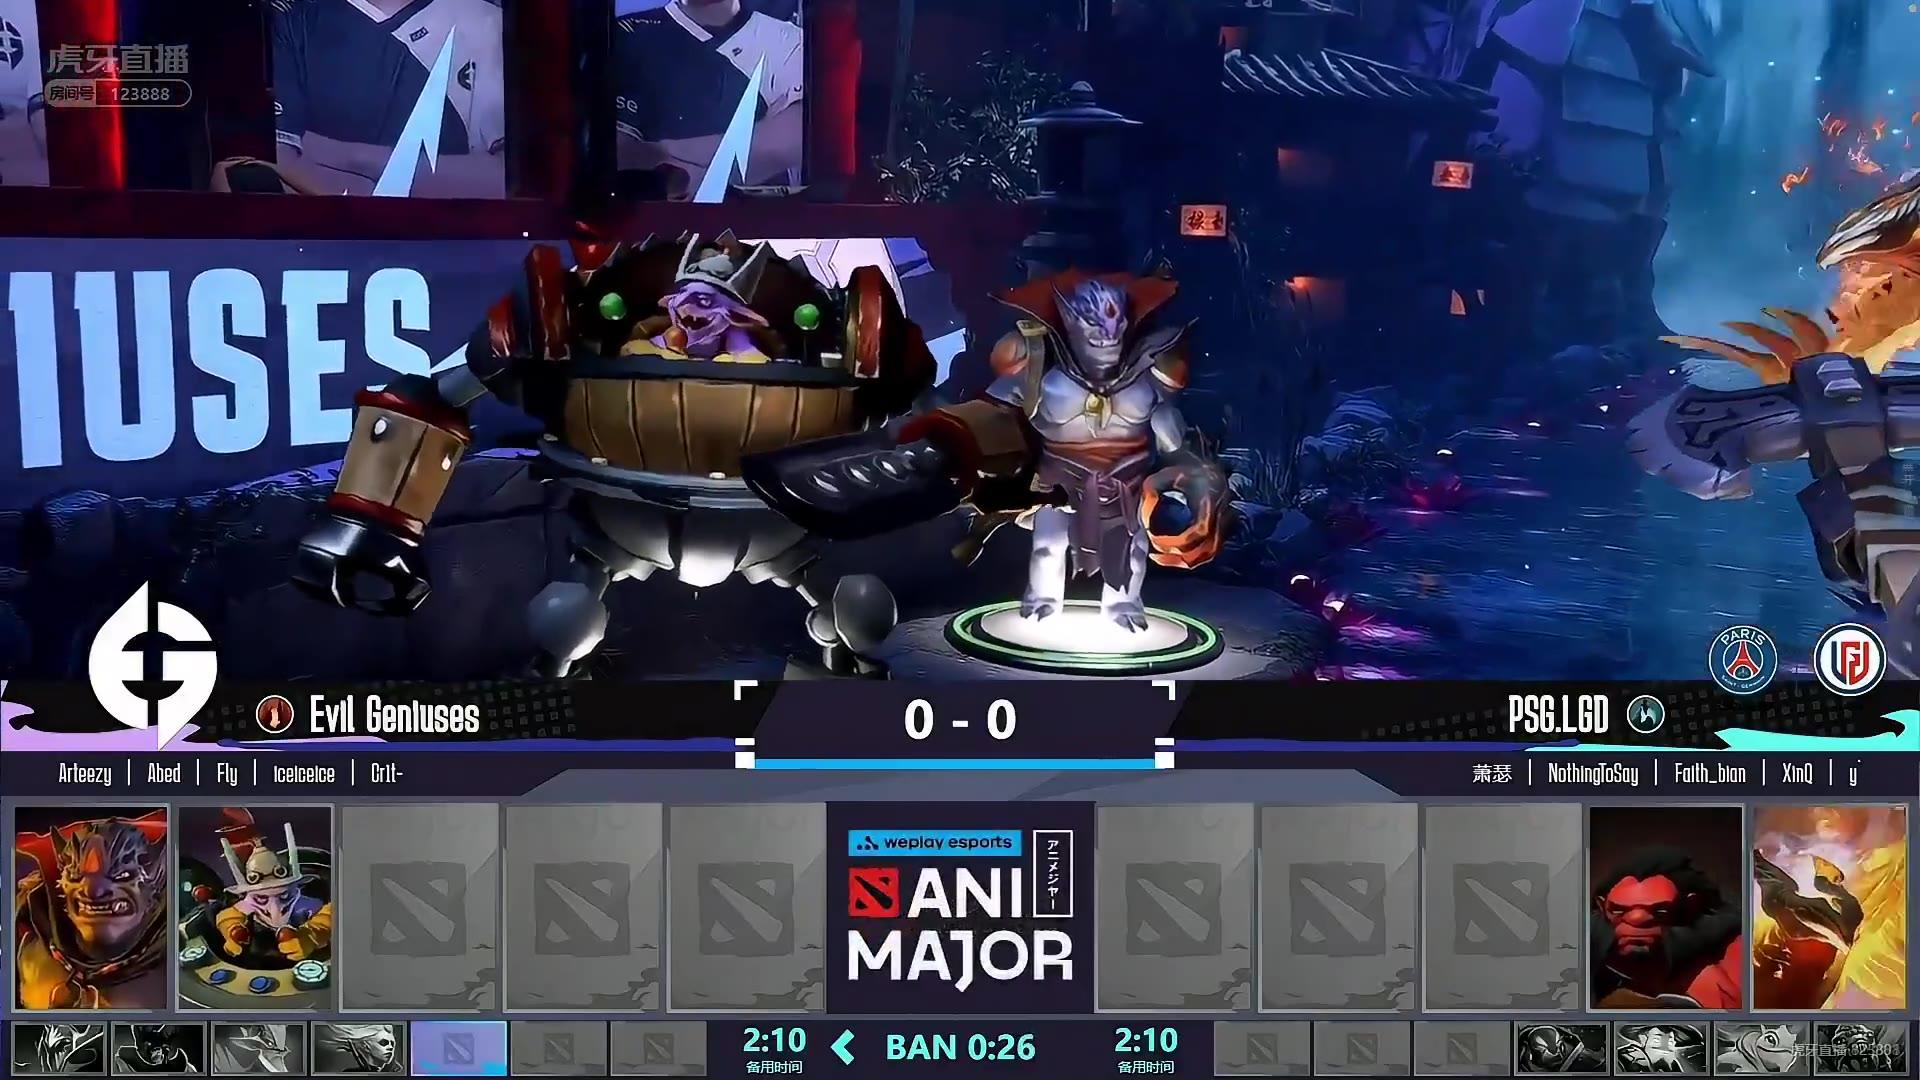 [sccc解说]DOTA2-基辅AniMajor决赛PSG.LGD-EG